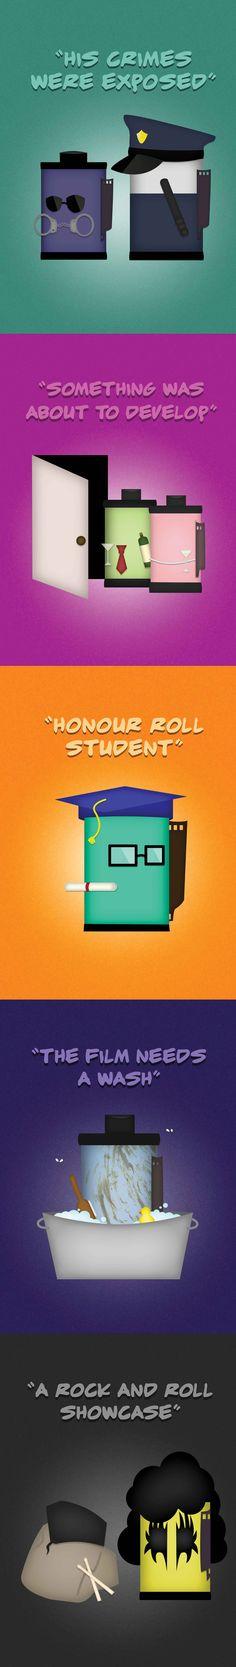 A series of pun illustrations revolving around film rolls. Enjoy!